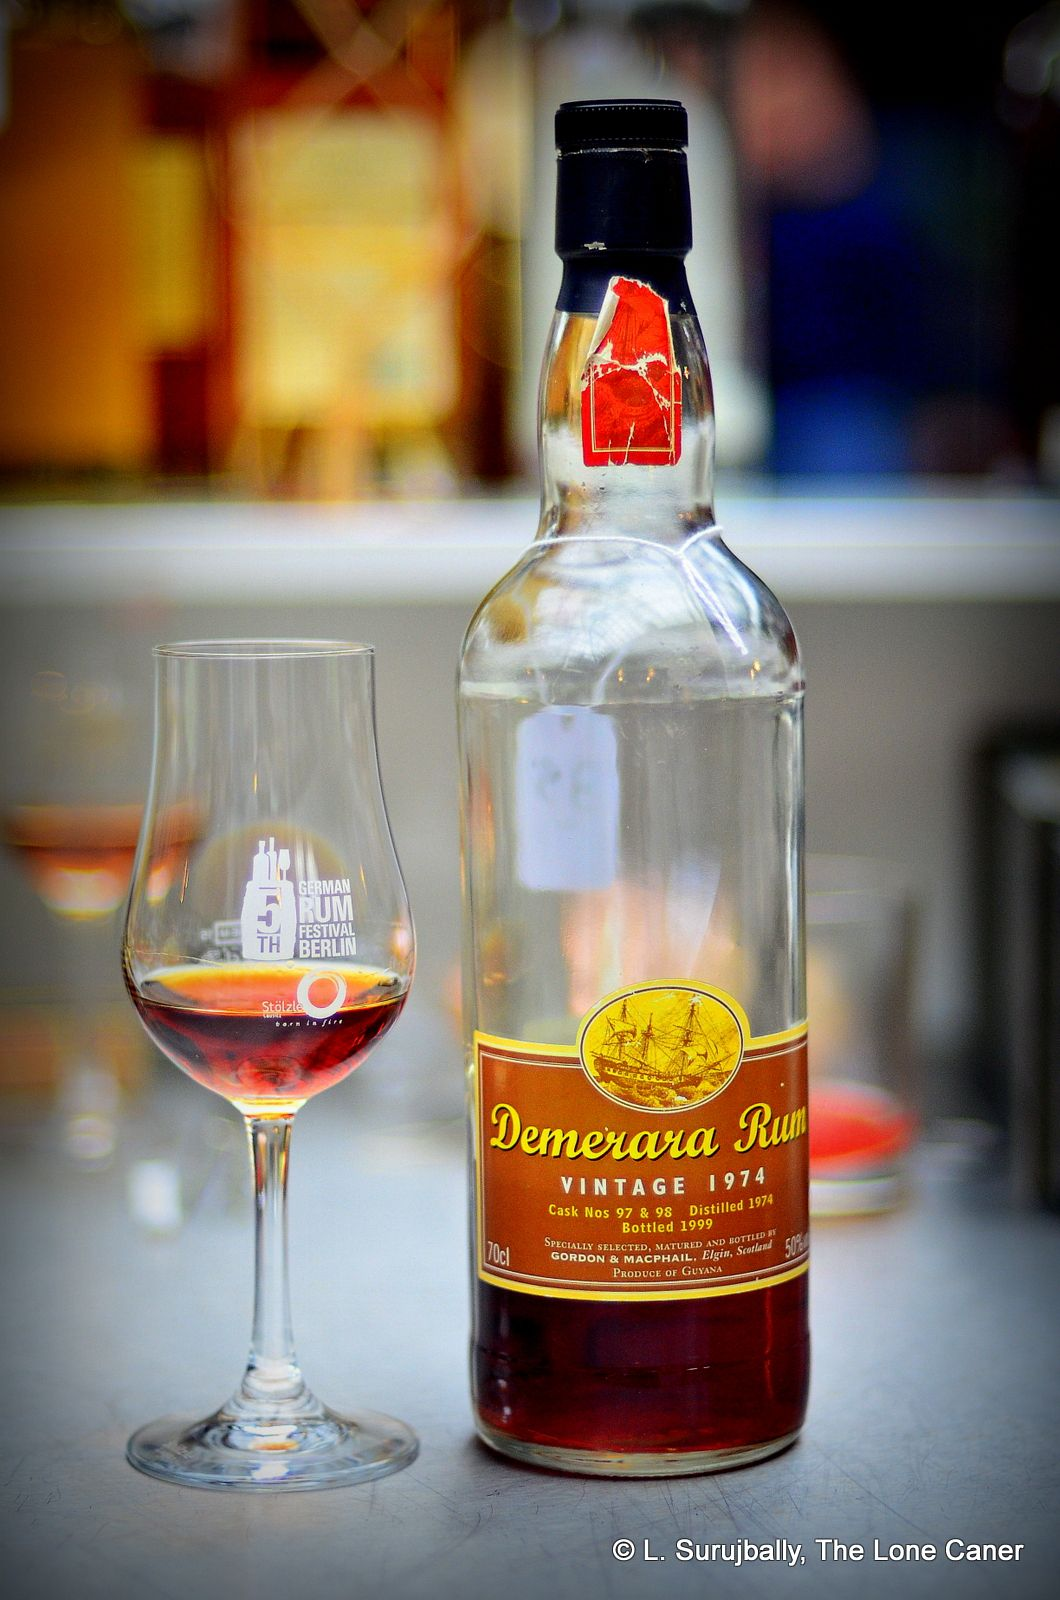 Gordon & MacPhail Demerara 1974 25 Year Old Rum Review